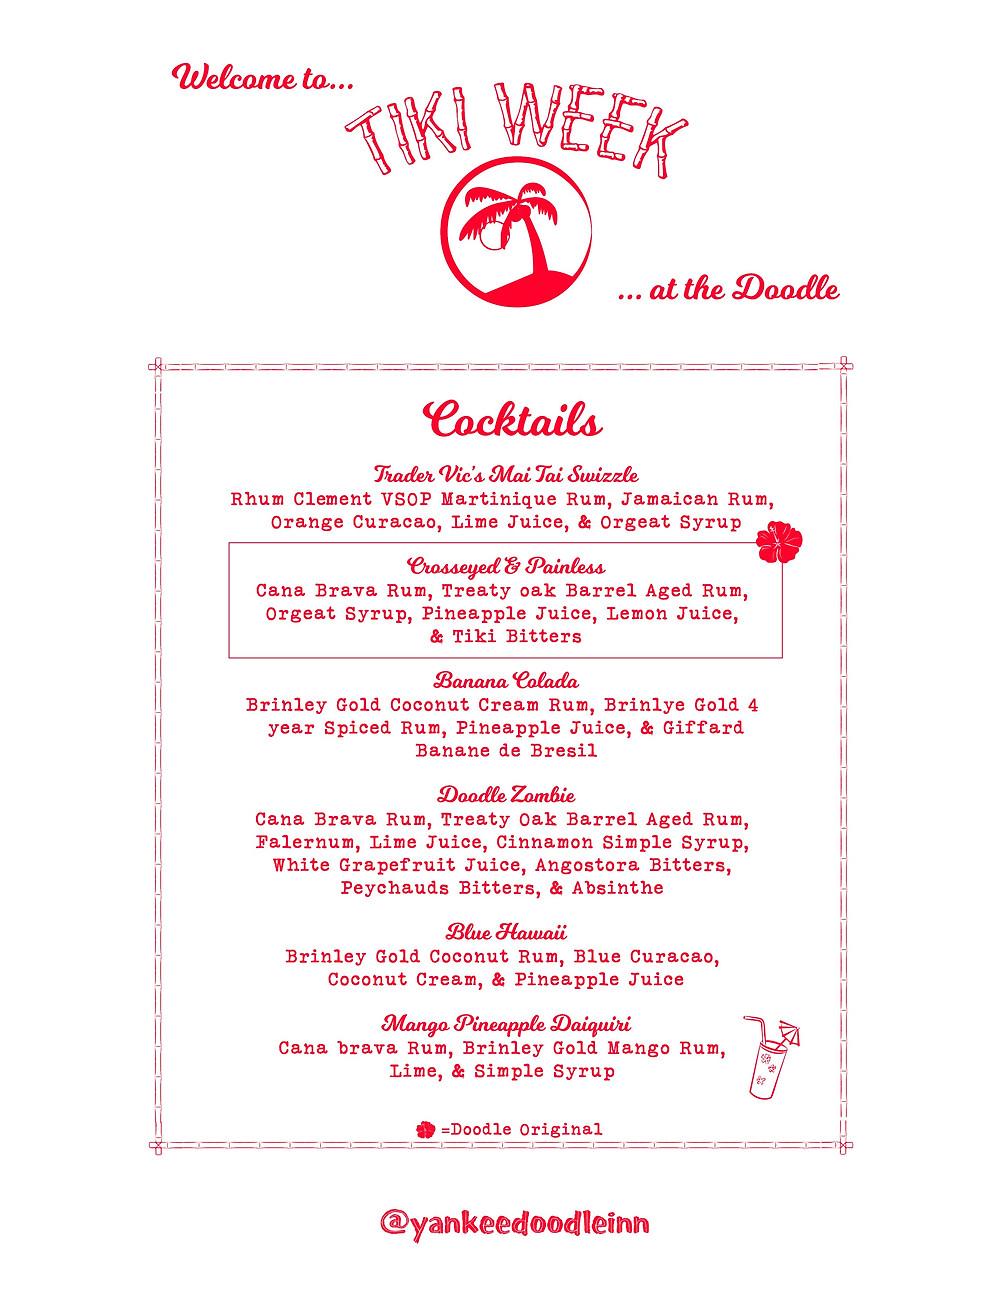 Sneak Peak at our cocktail list for tiki week!